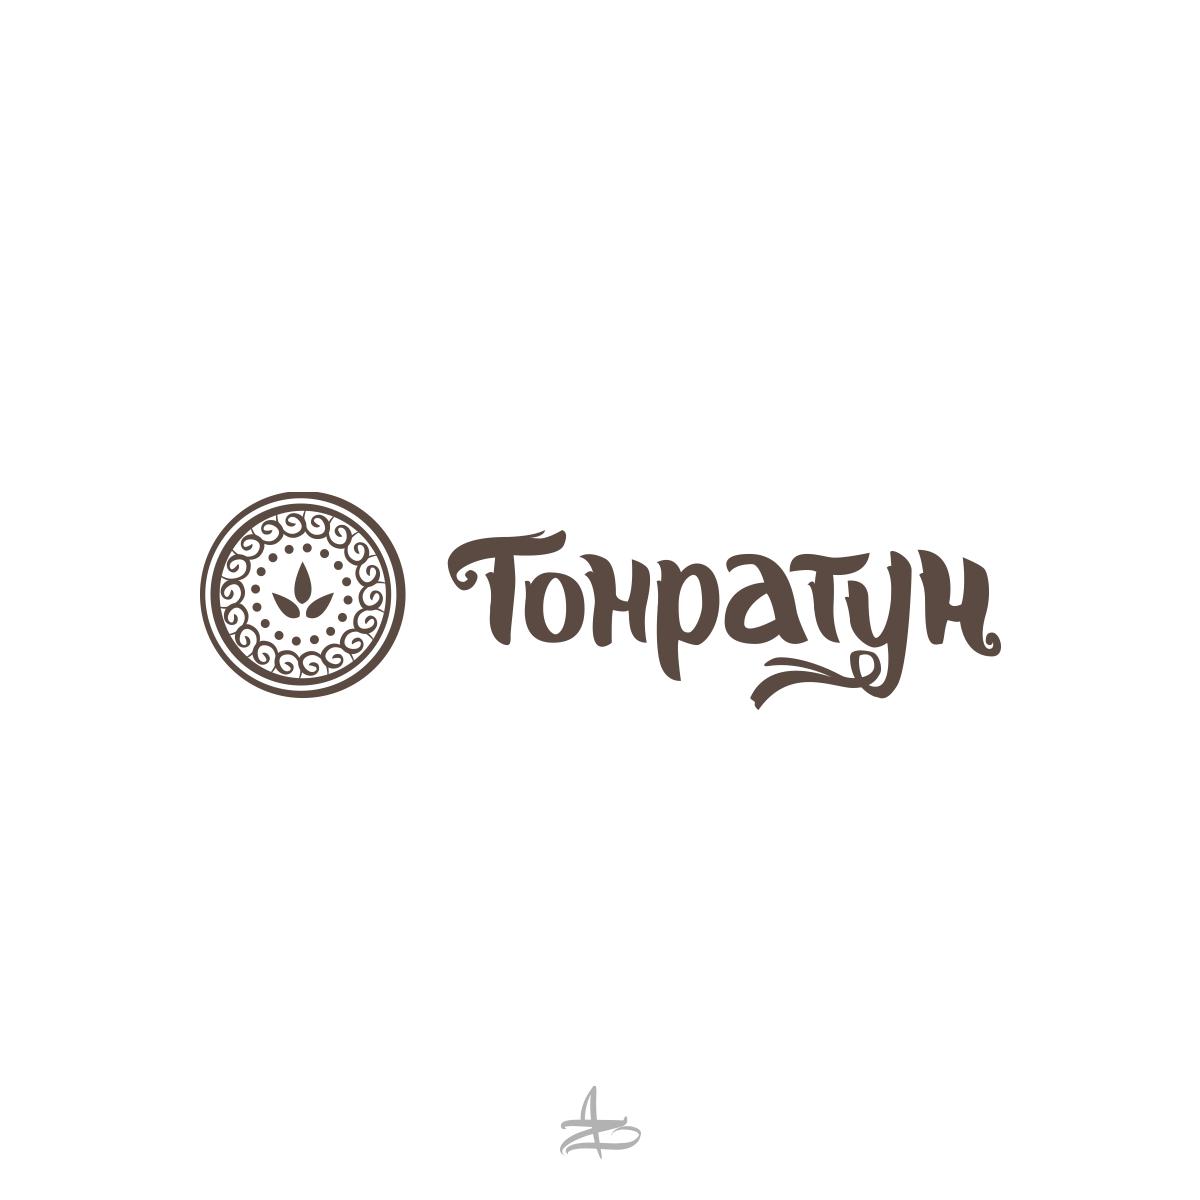 Логотип для Пекарни-Тандырной  фото f_1875d914286ab8a7.png